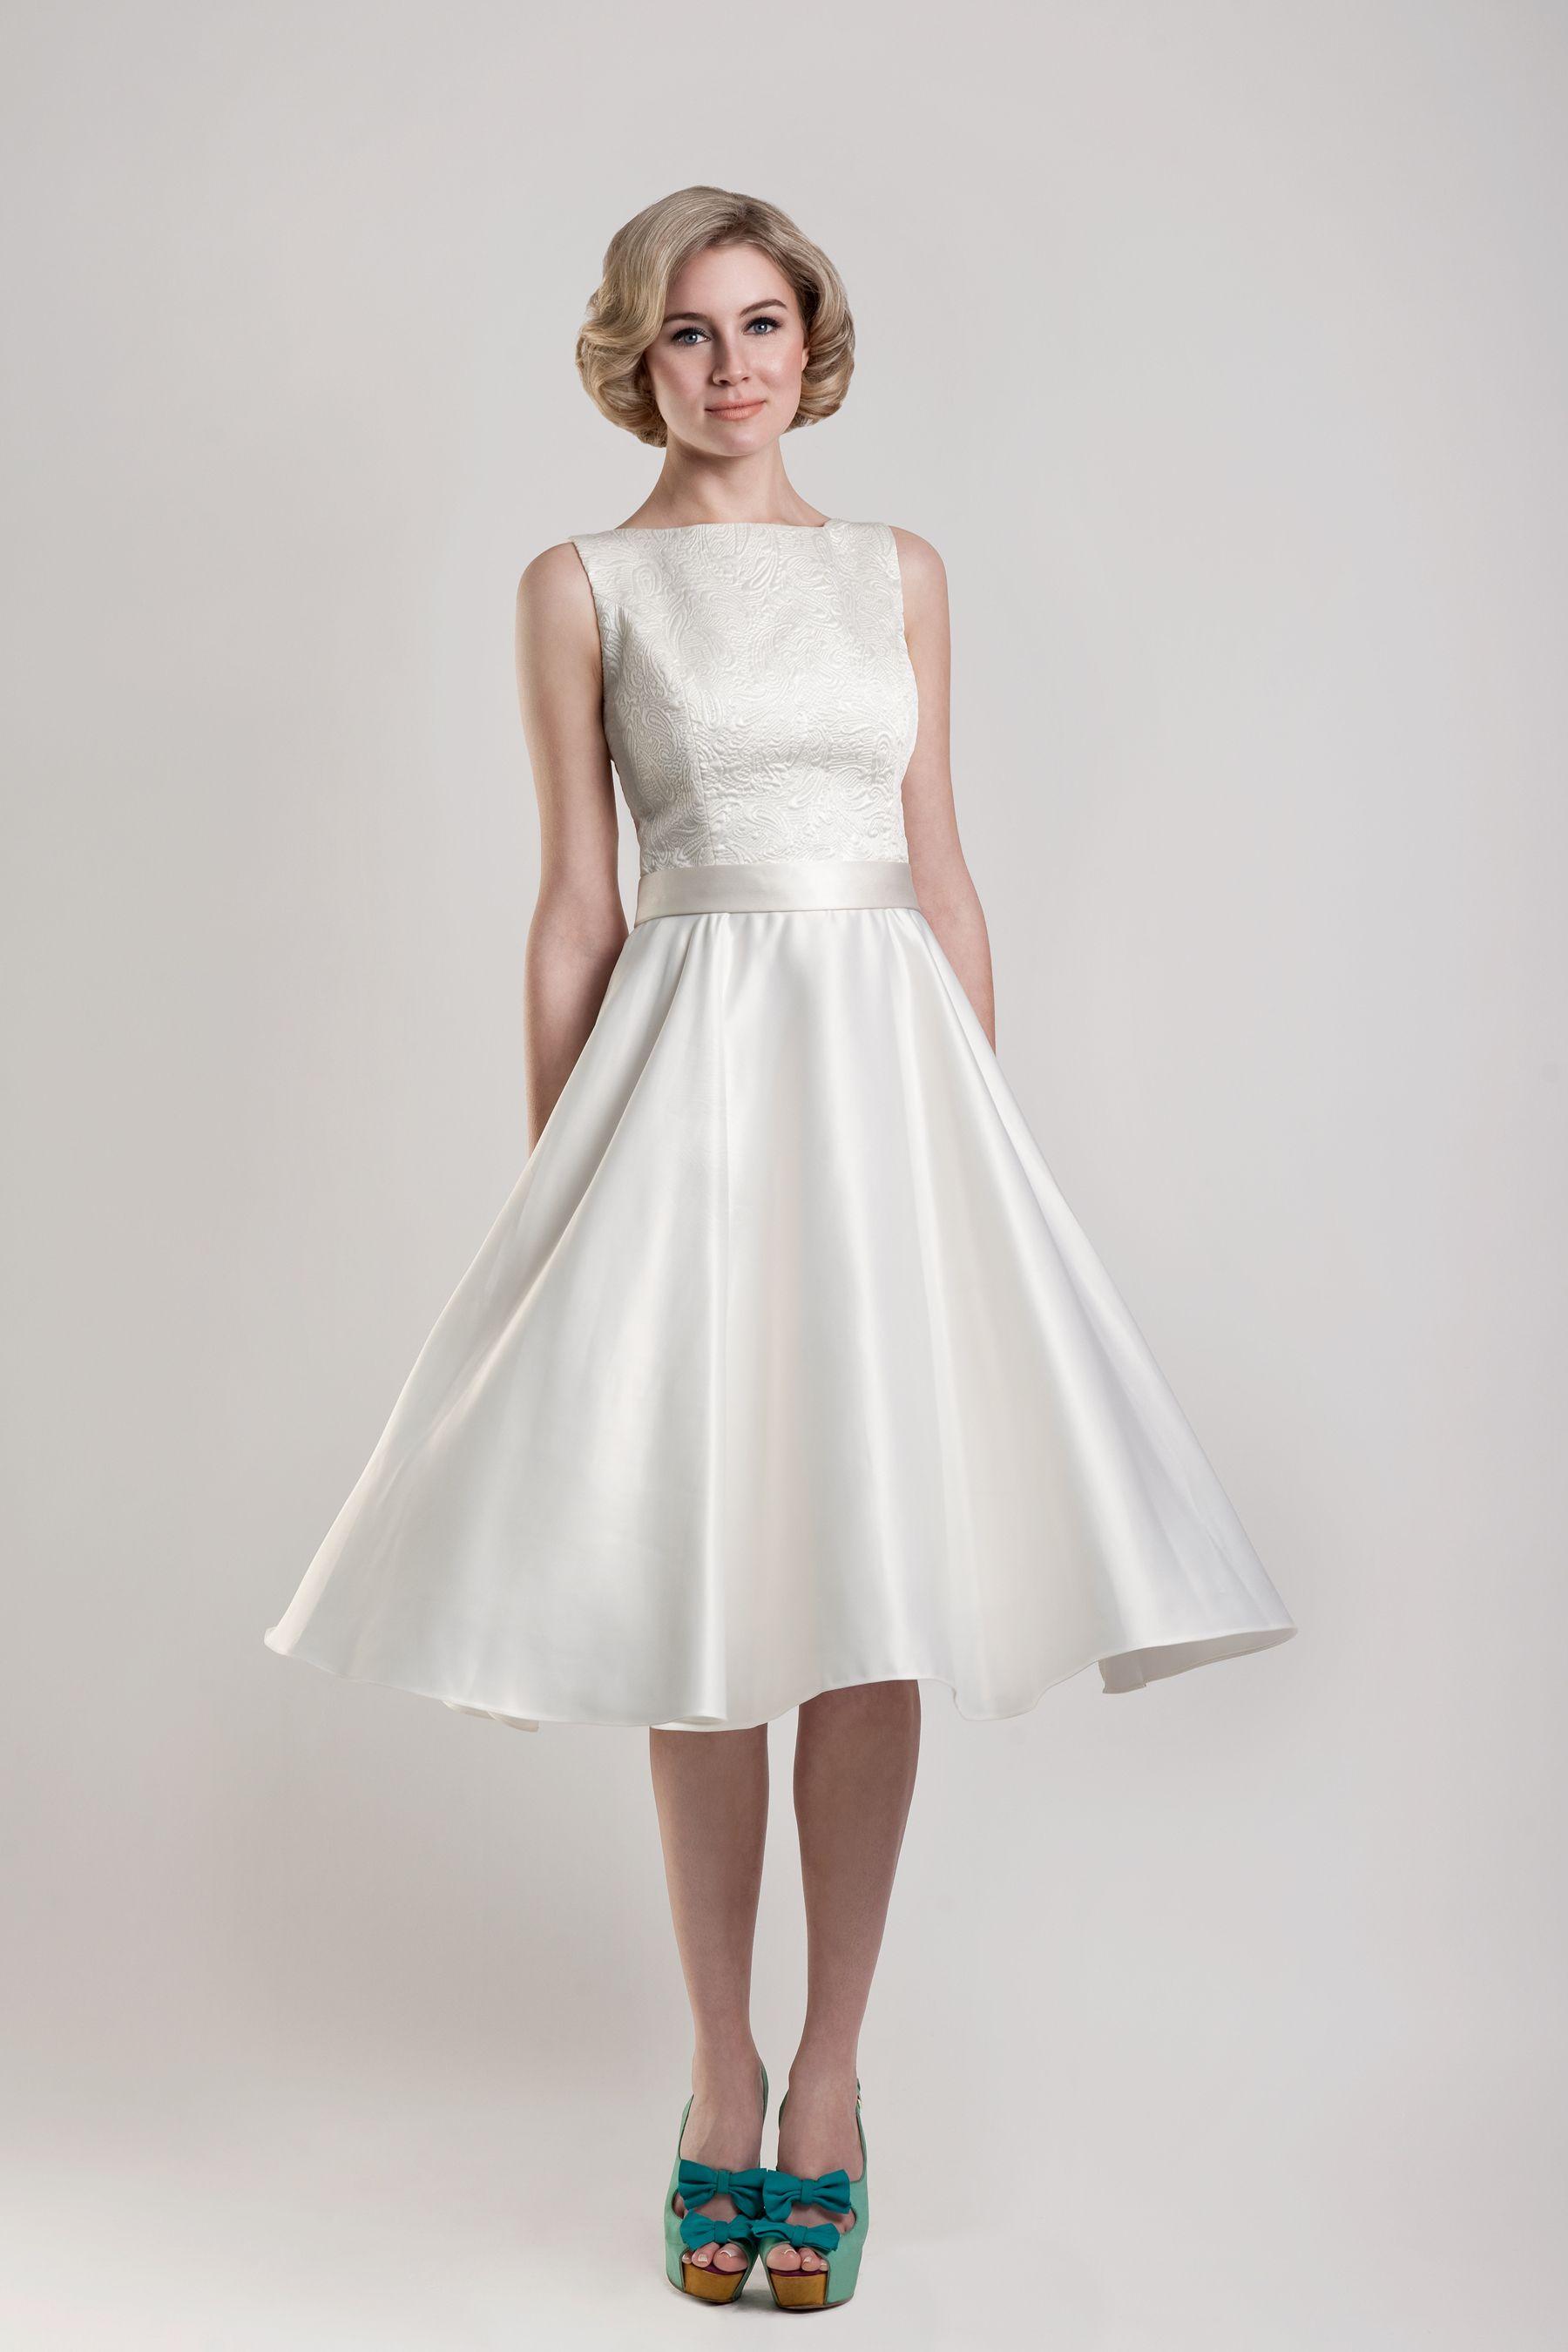 Tea Length Wedding Dresses,Short Wedding Dresses,1950s